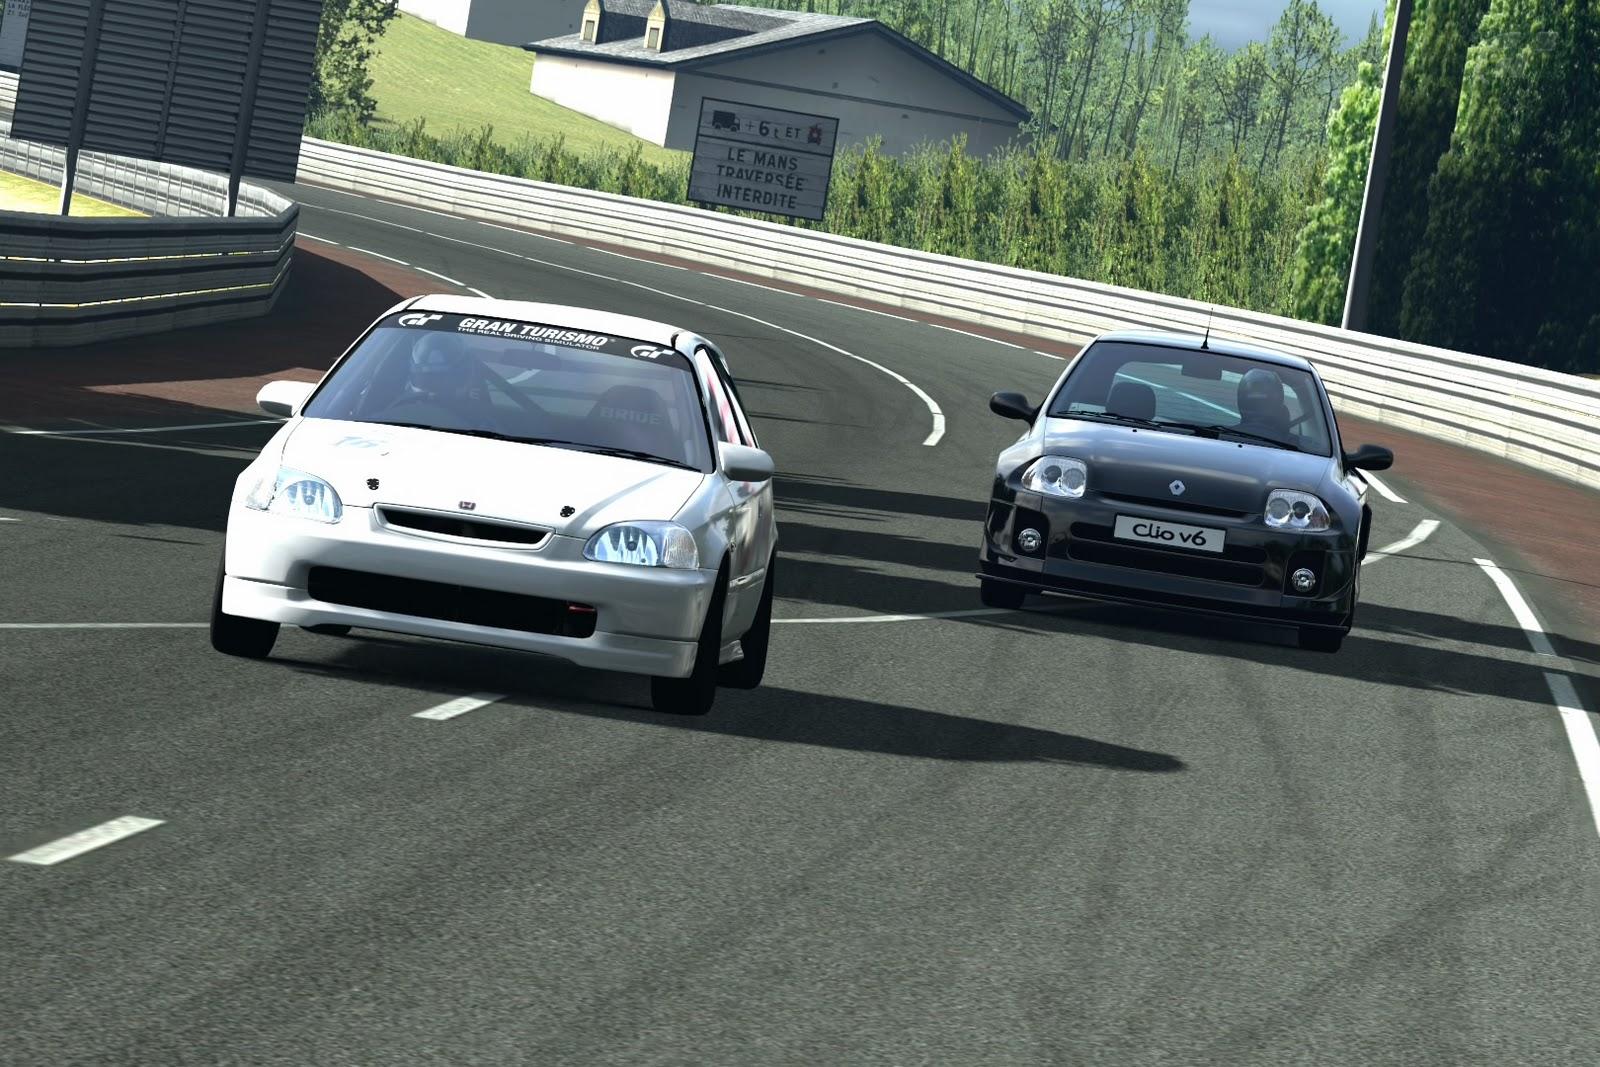 http://4.bp.blogspot.com/-BF1GHgPOspY/Tu-oND_SO7I/AAAAAAAAAI8/R44f-nQLjZc/s1600/Circuit+de+la+Sarthe+2009.jpg